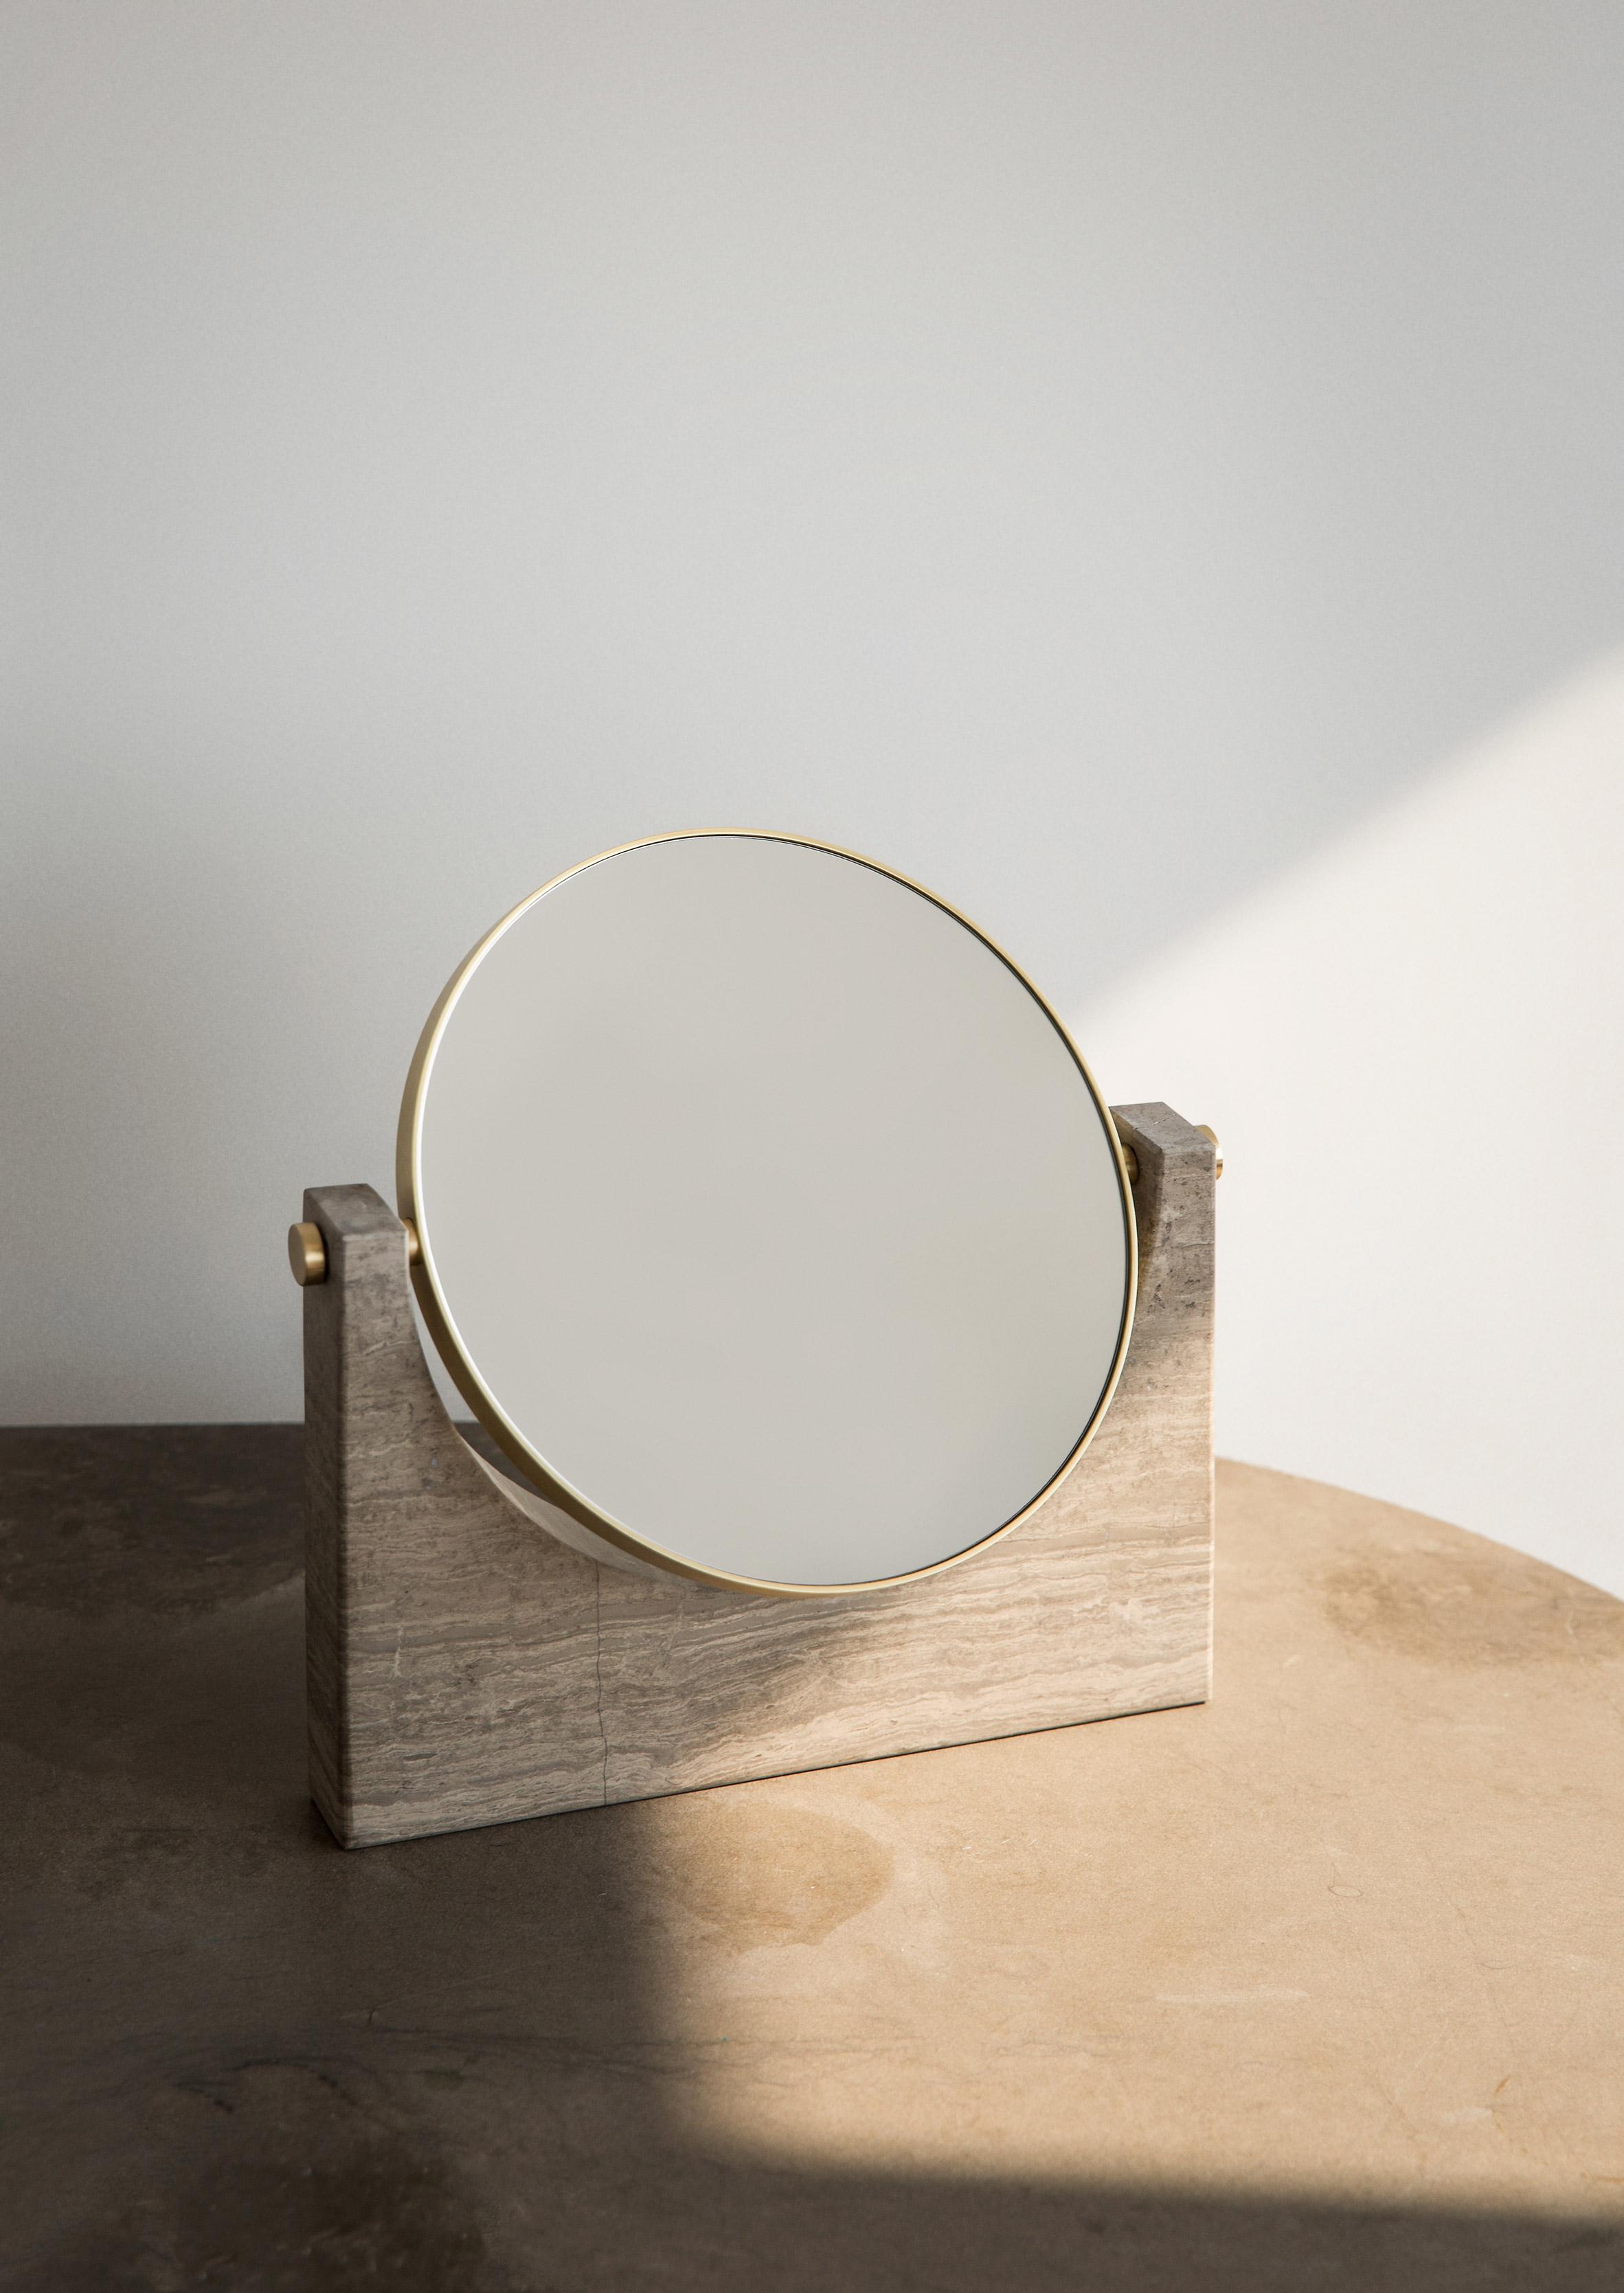 maison-objet-menu-design-furniture-lighting-tables_dezeen_2364_col_10